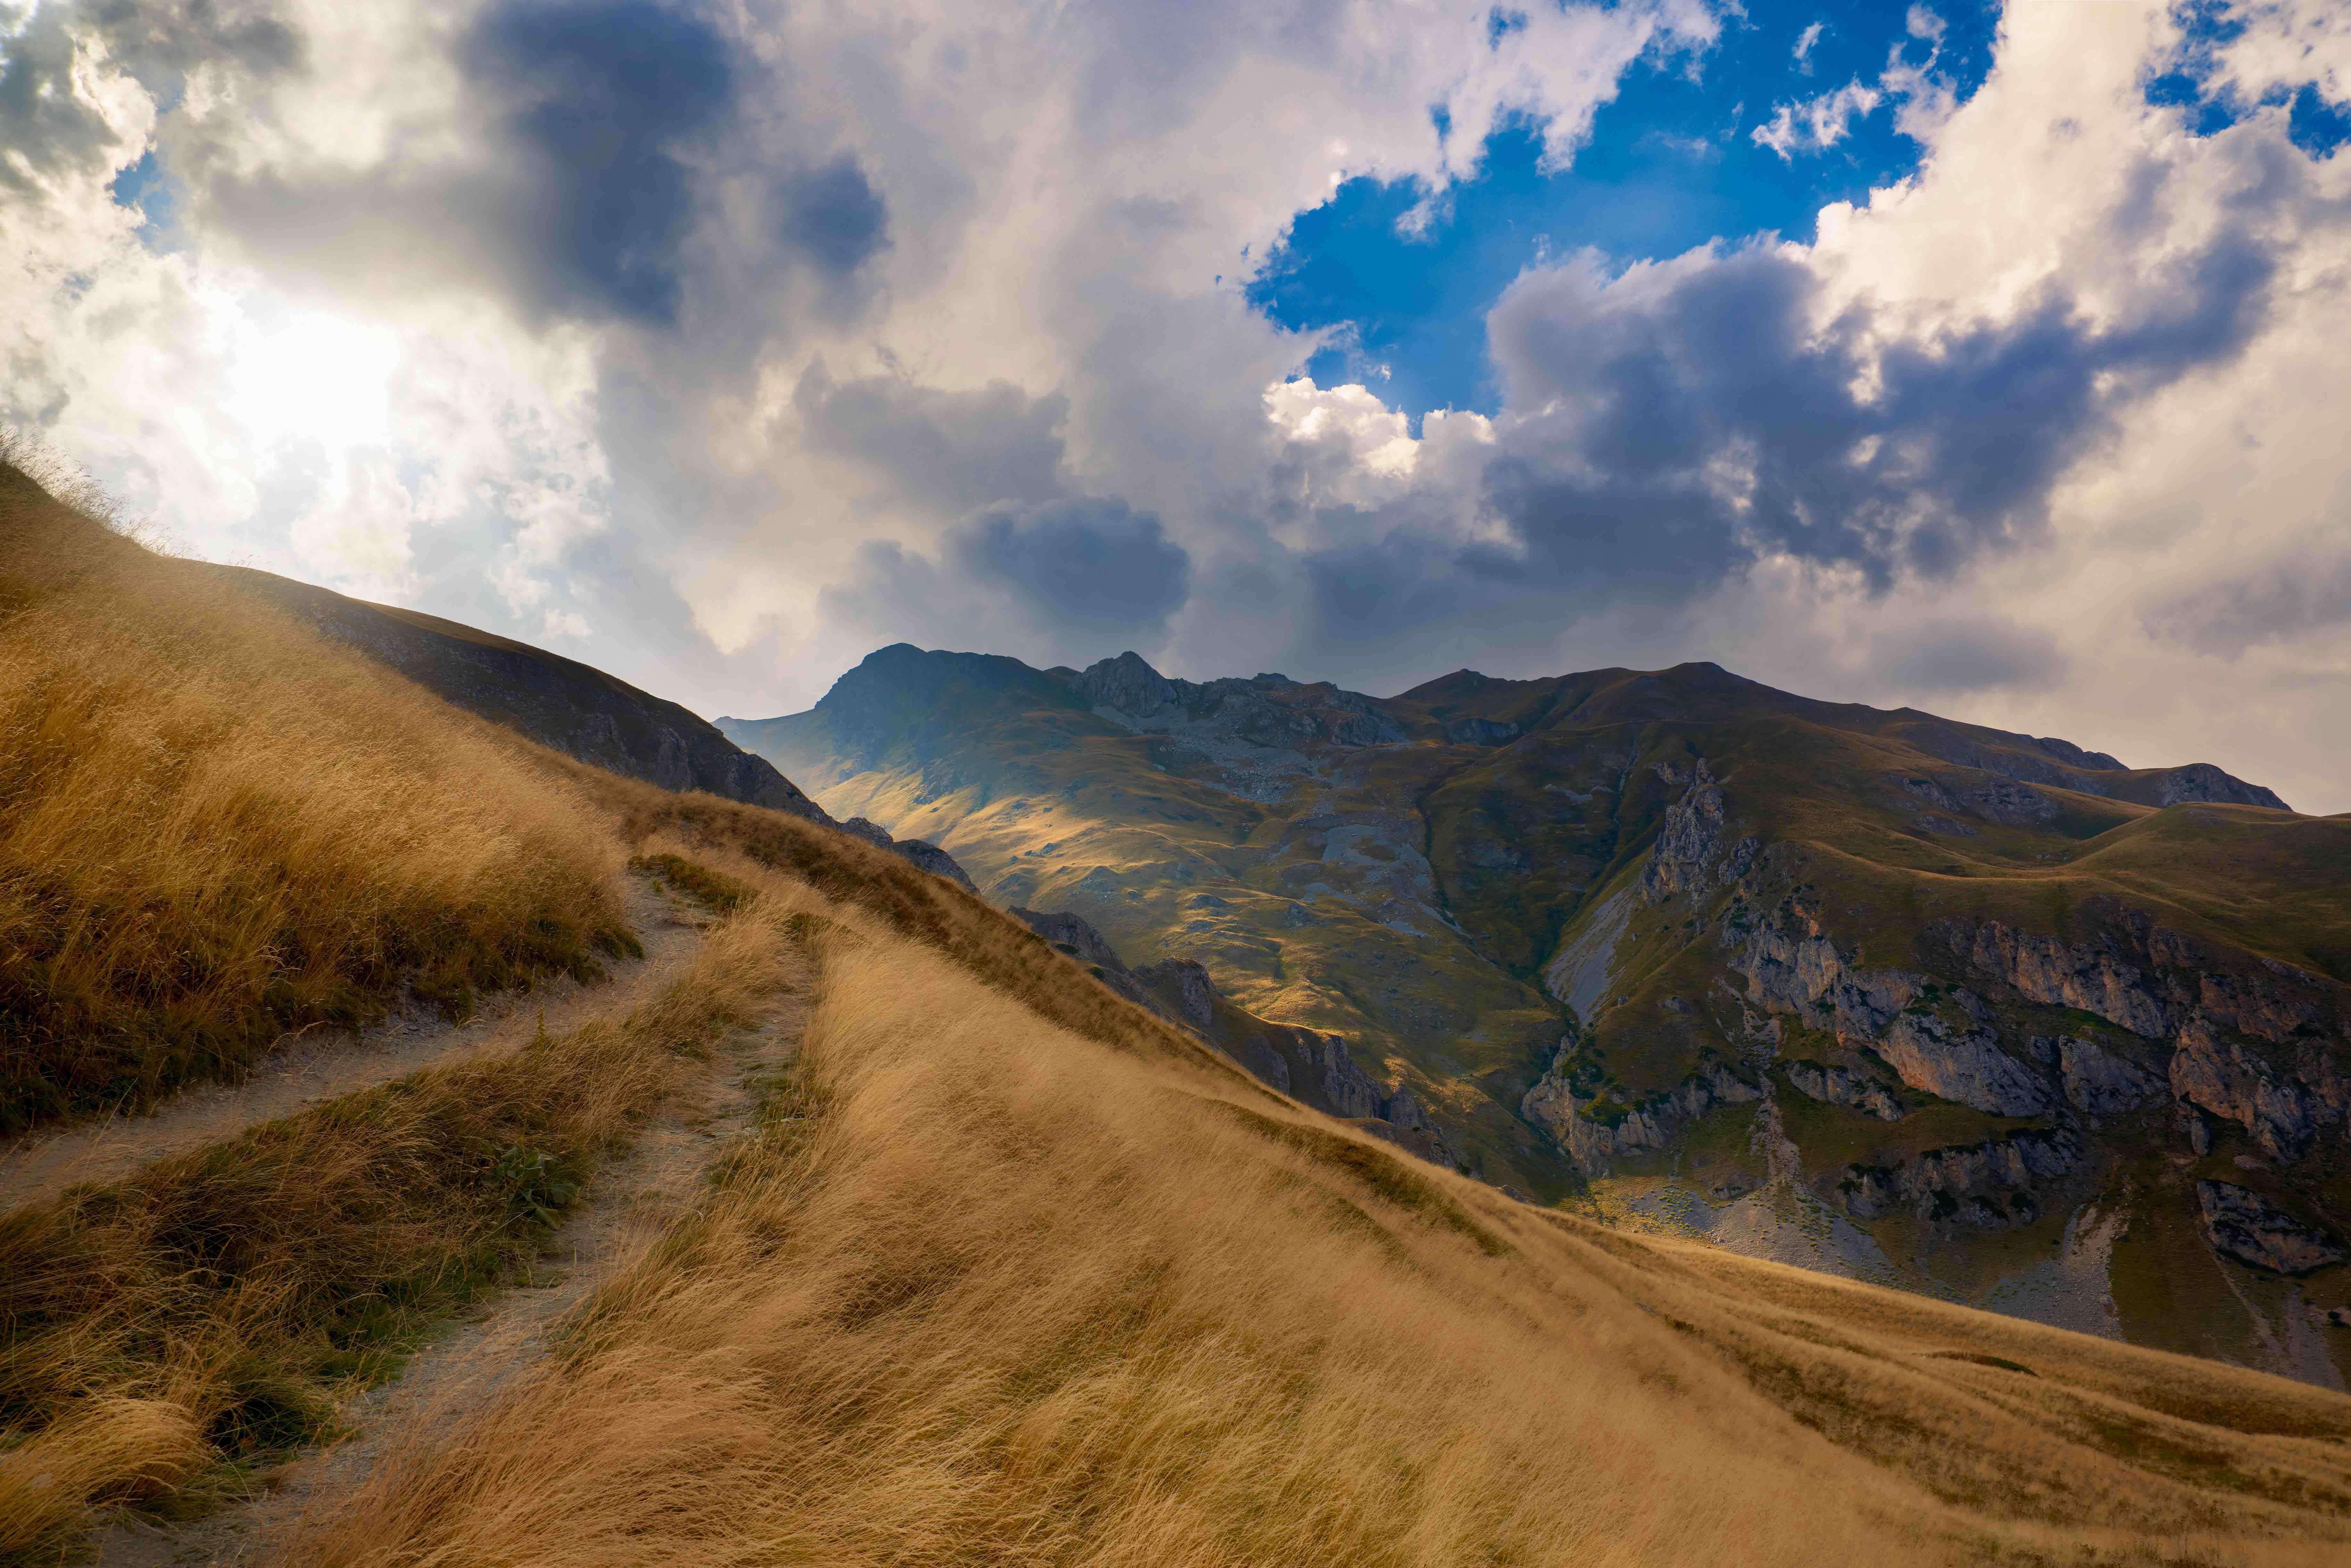 The jagged peaks and winding hiking paths of Mavrovo, Macedonia.